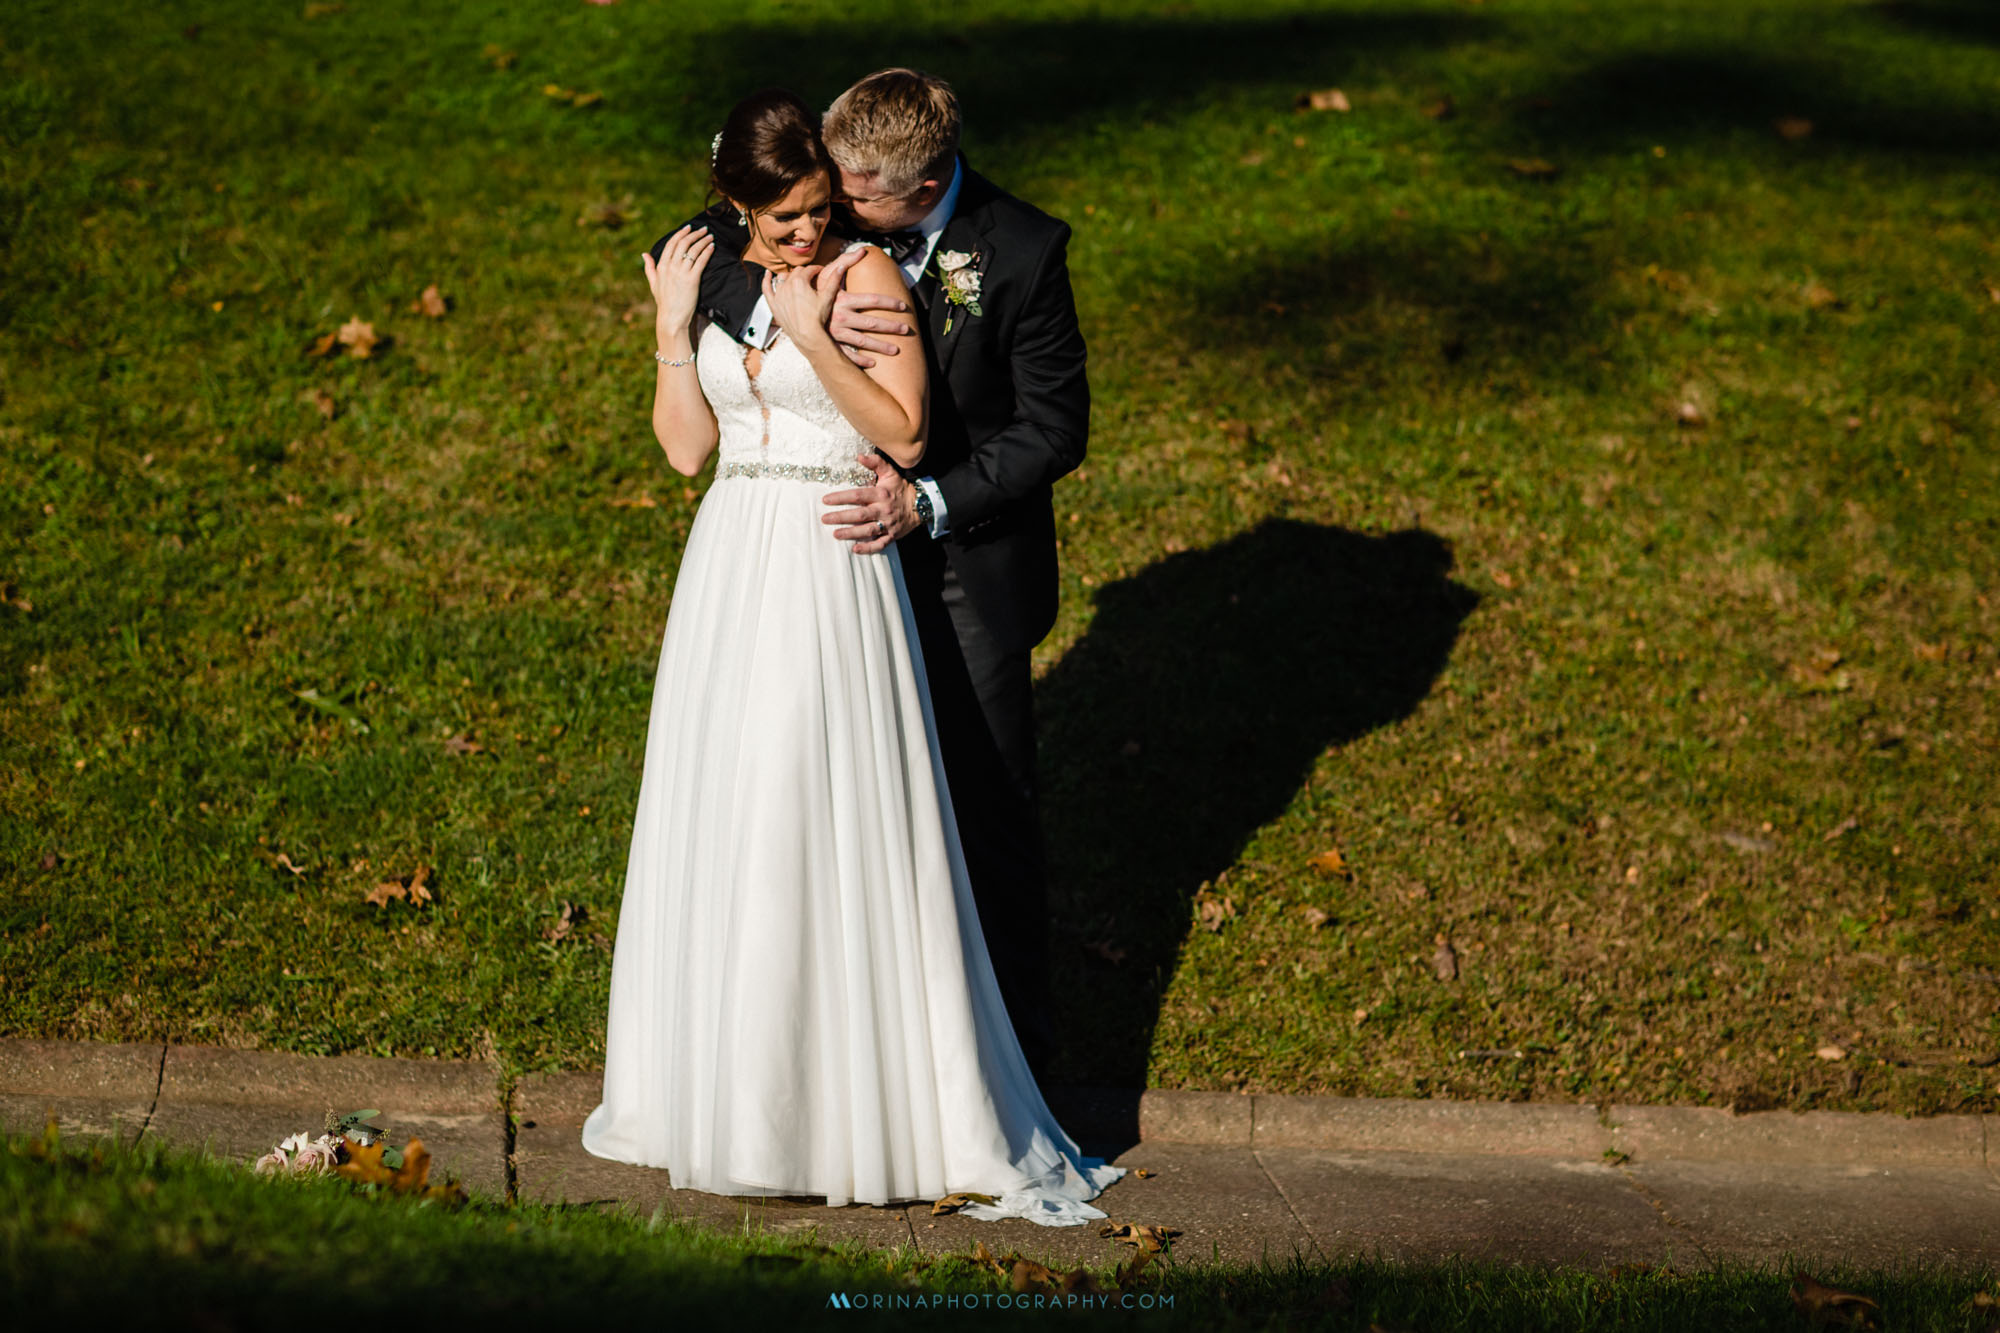 Colleen & Bill Wedding at Manufacturers' Golf & Country Club wedding 0055.jpg